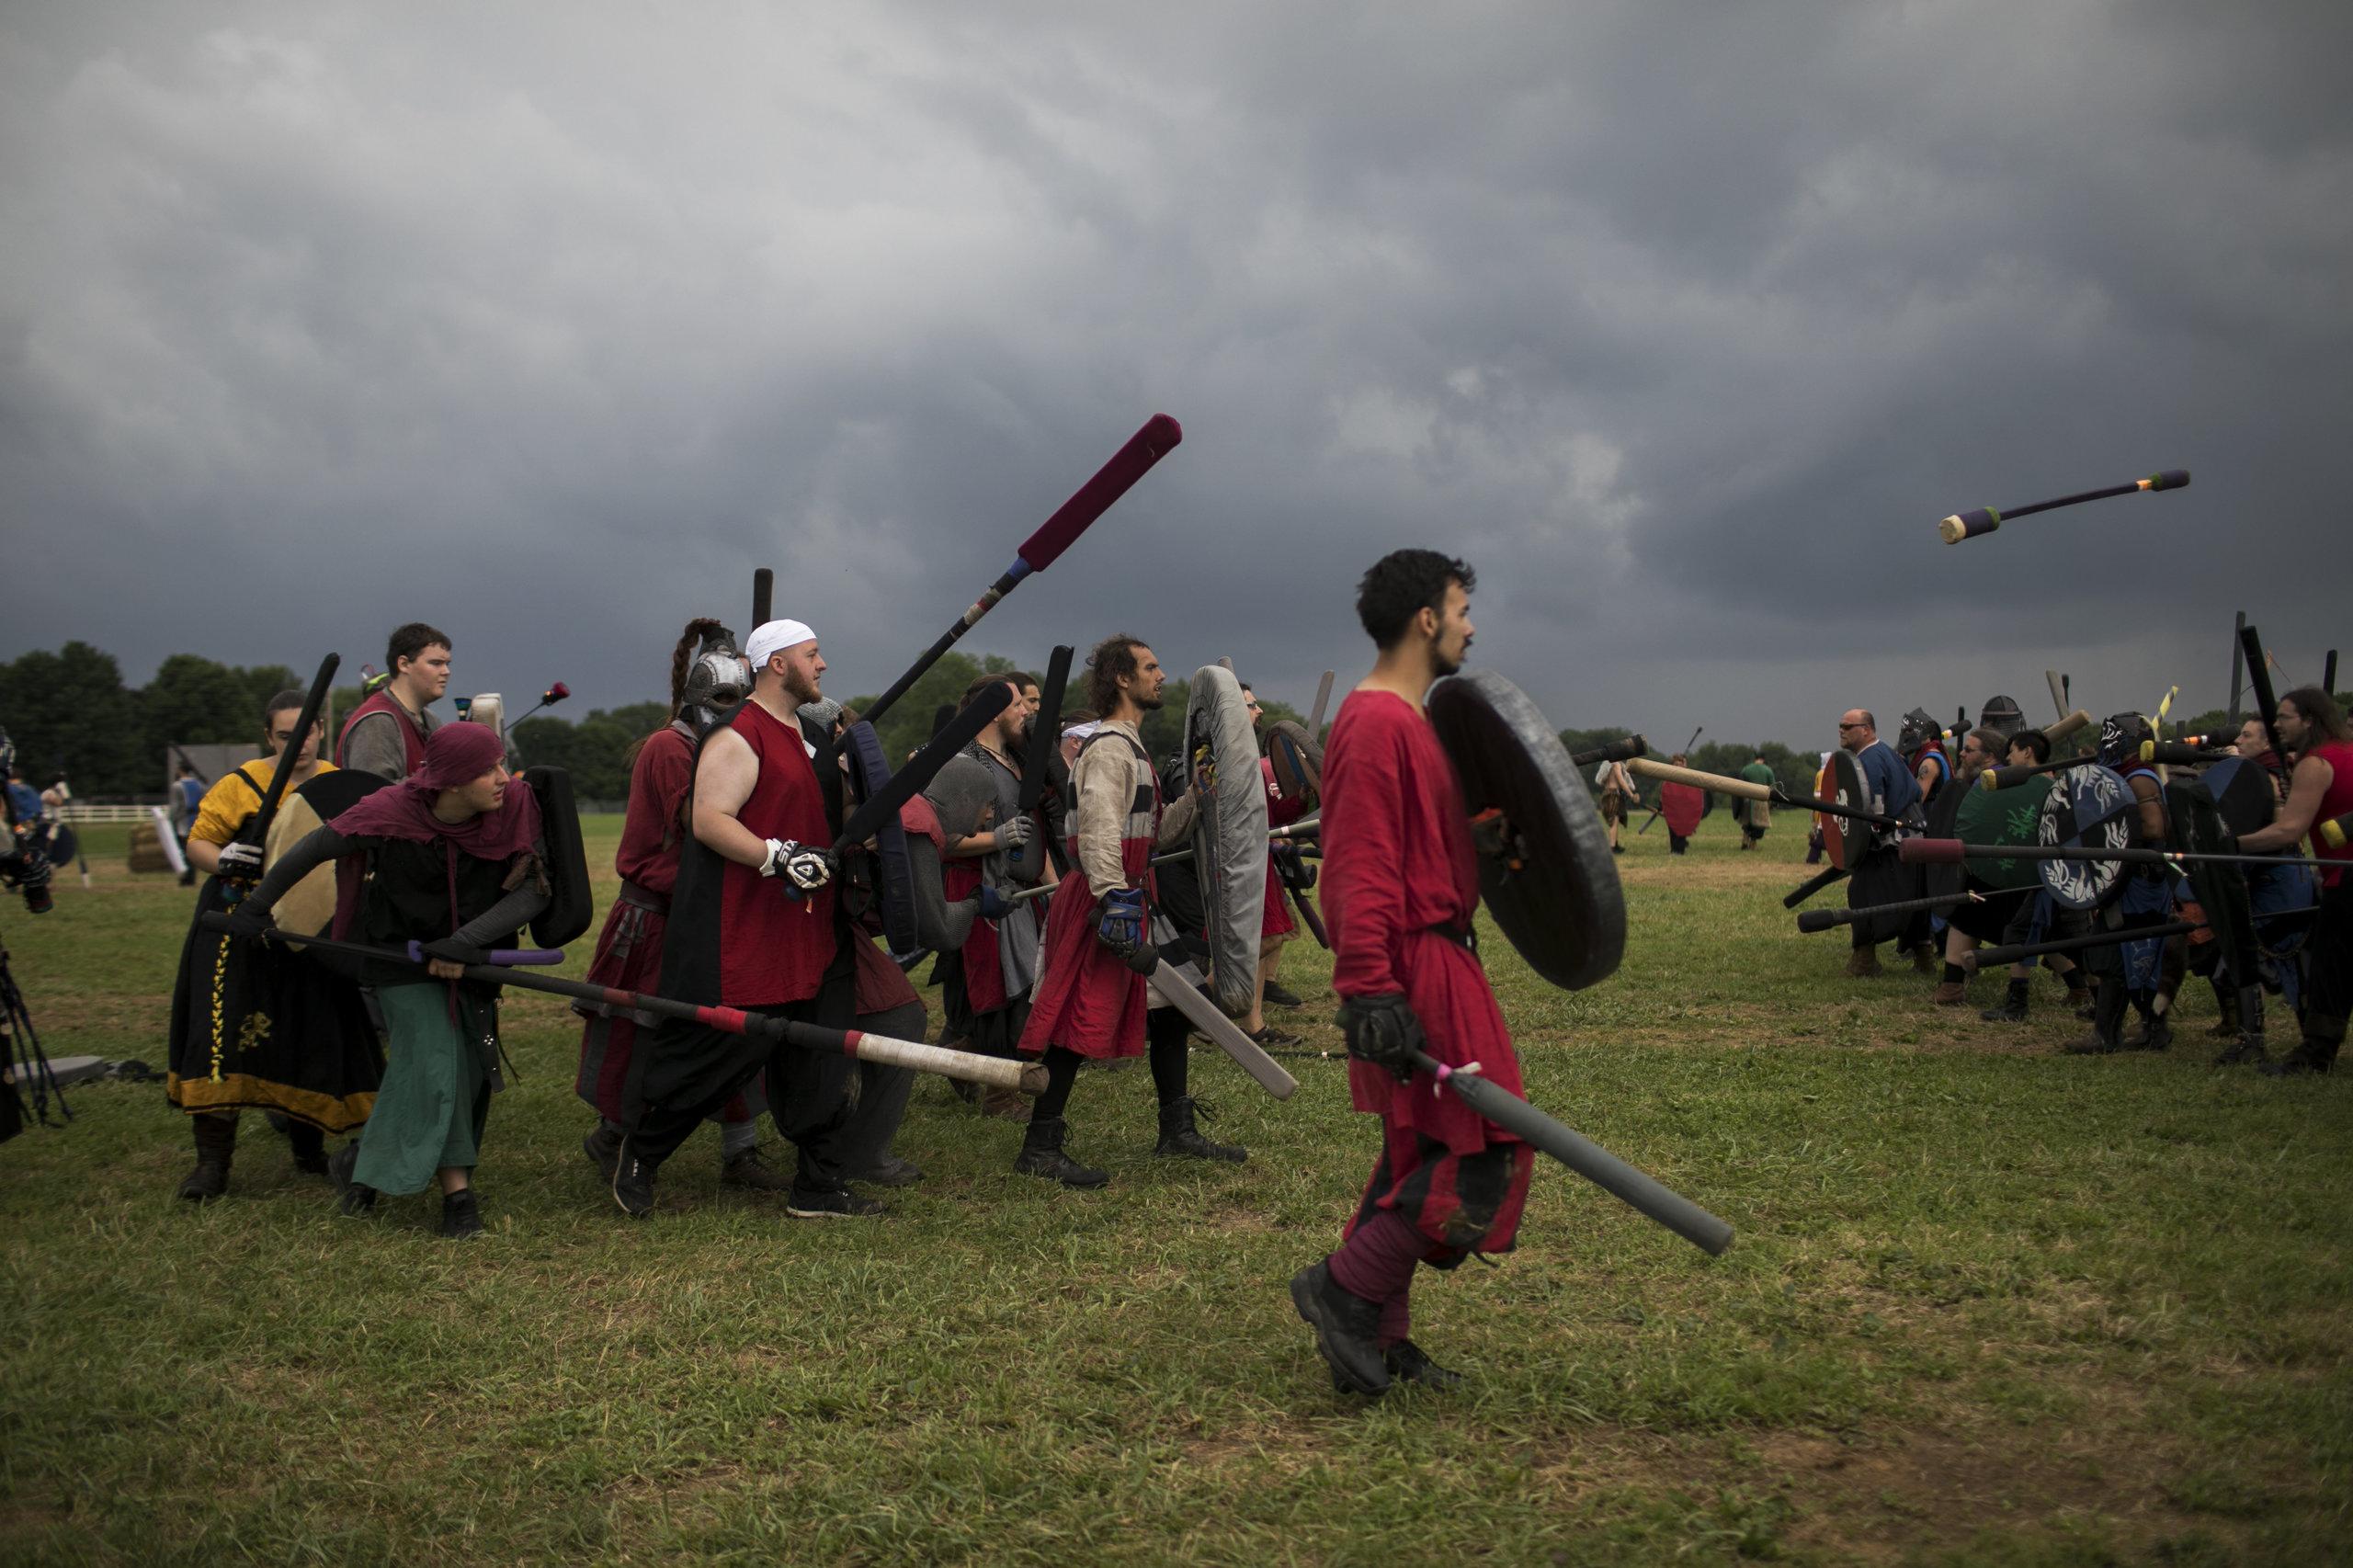 Dagorhirrim battle at Ragnarok, an annual live action roleplay battle in Slippery Rock, Pennsylvania.